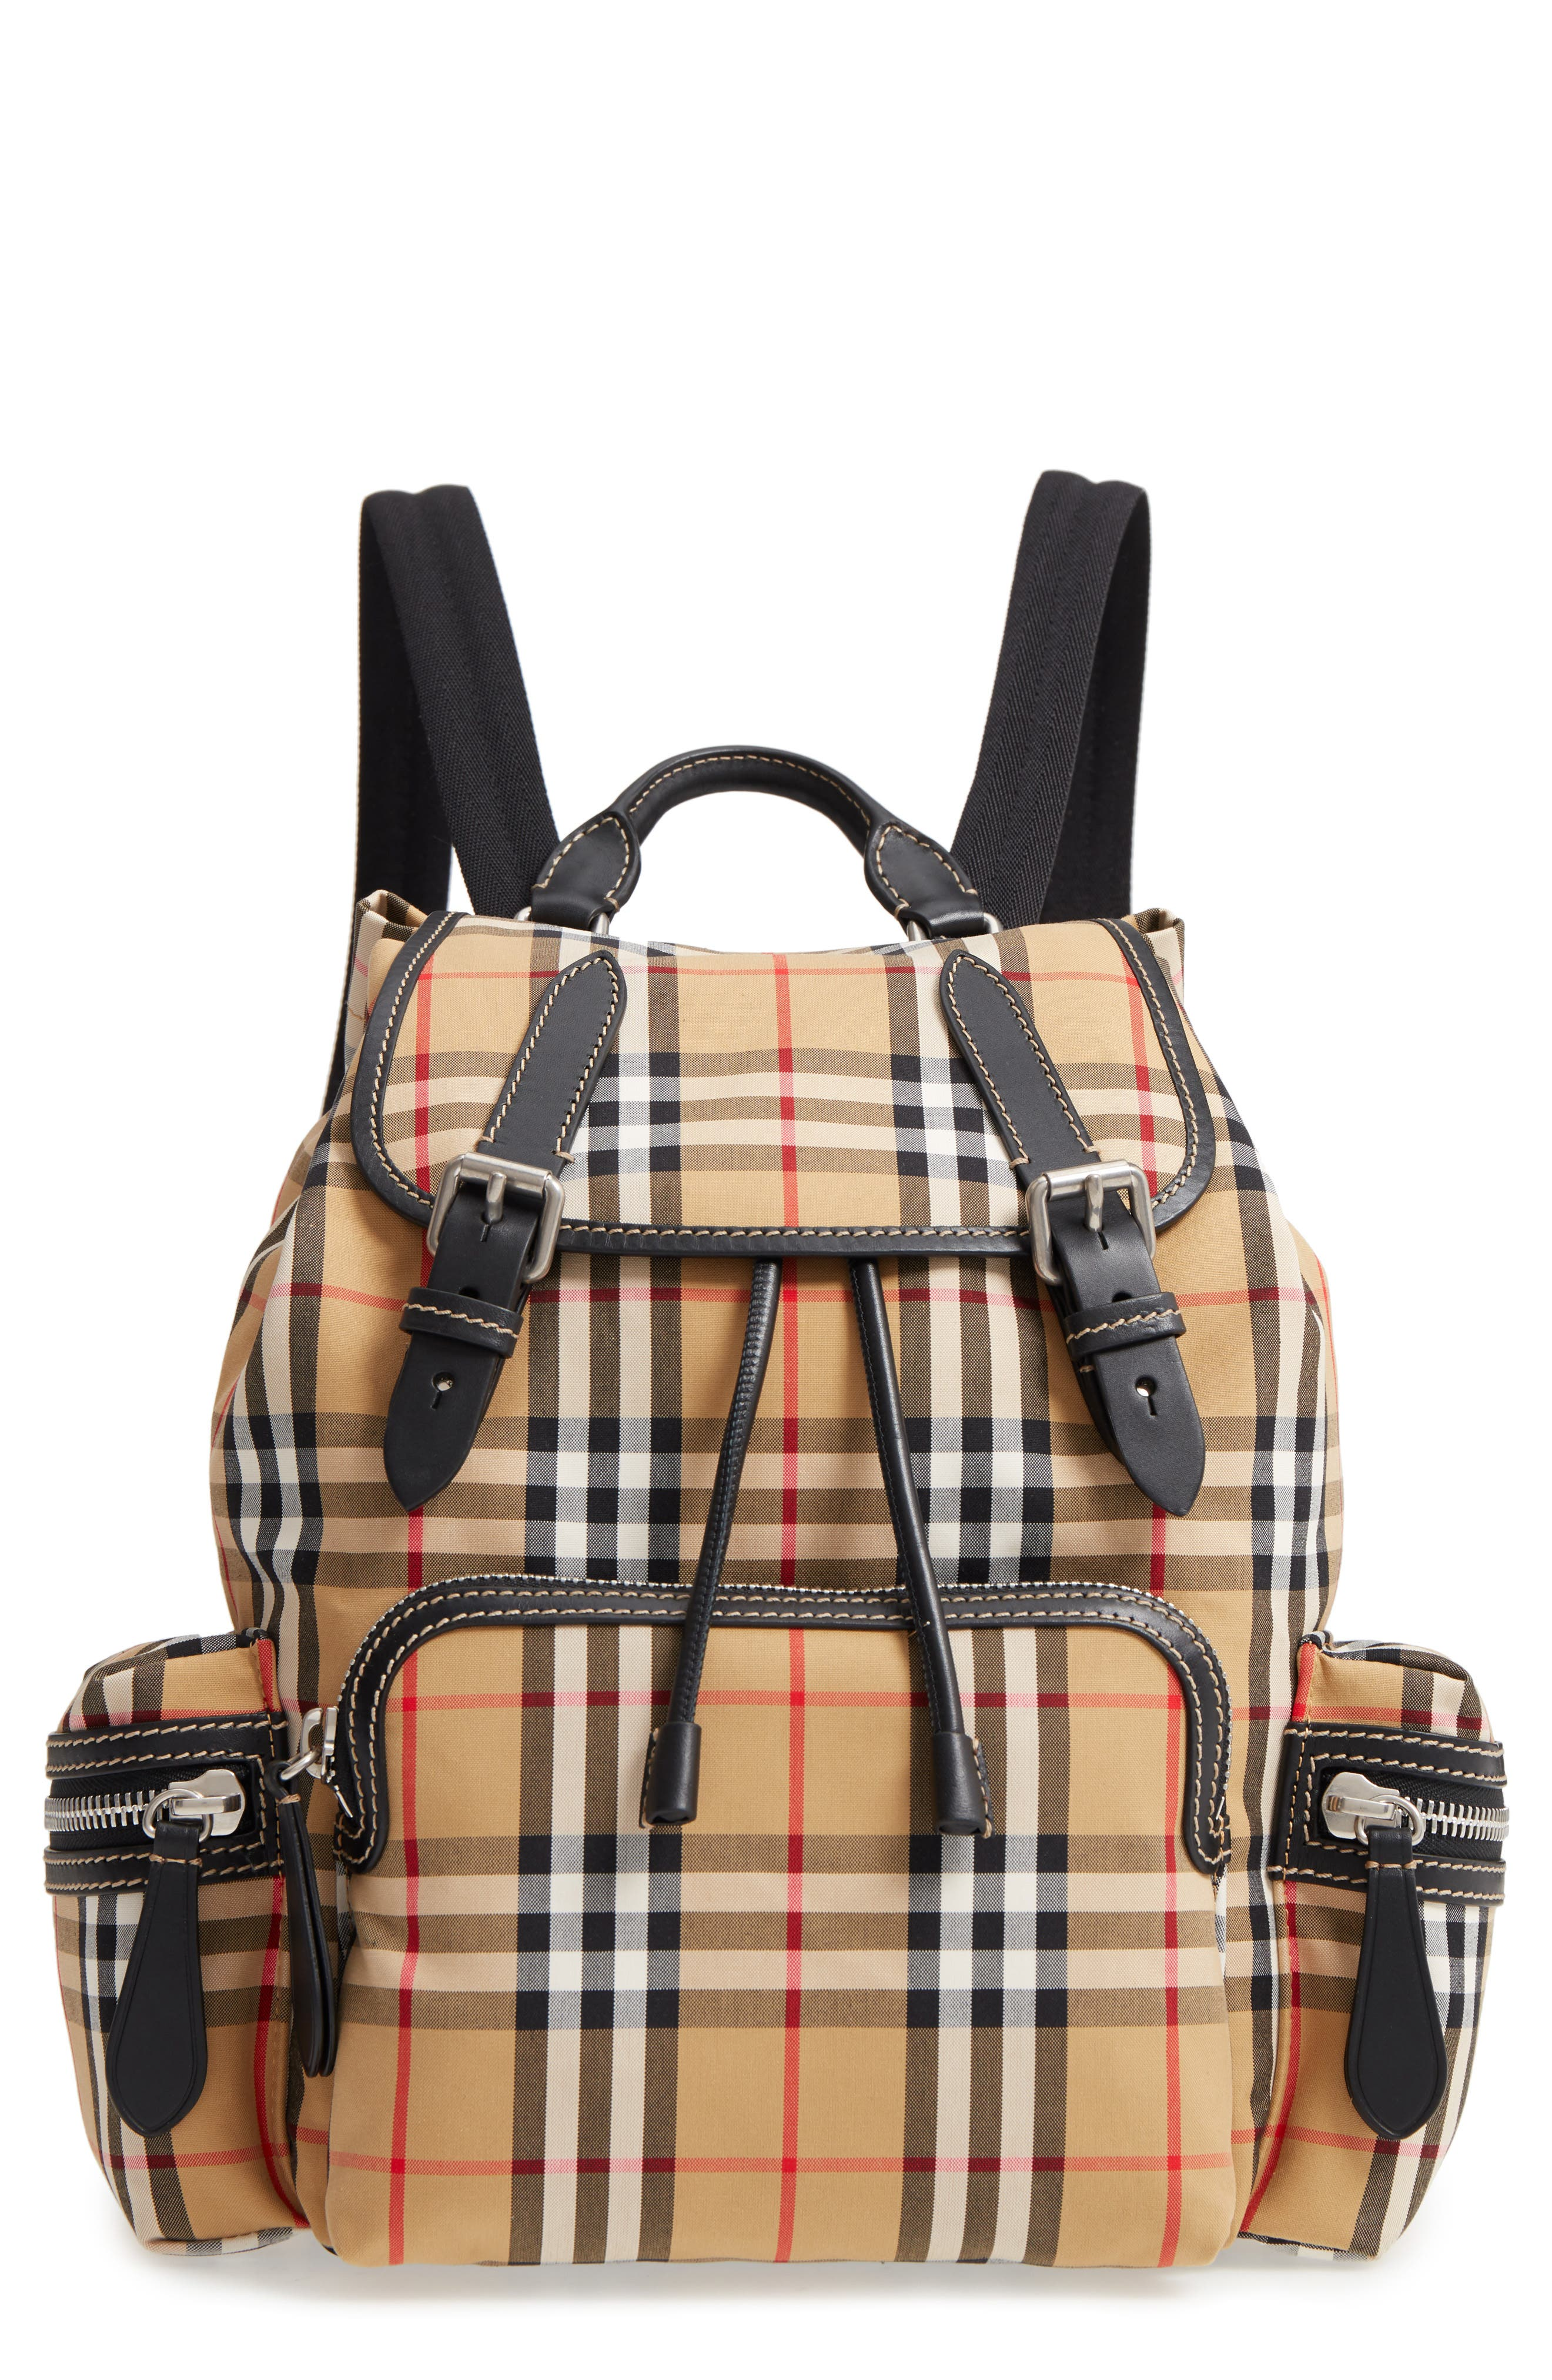 Medium Rucksack Check Cotton Backpack,                             Main thumbnail 1, color,                             ANTIQUE YELLOW